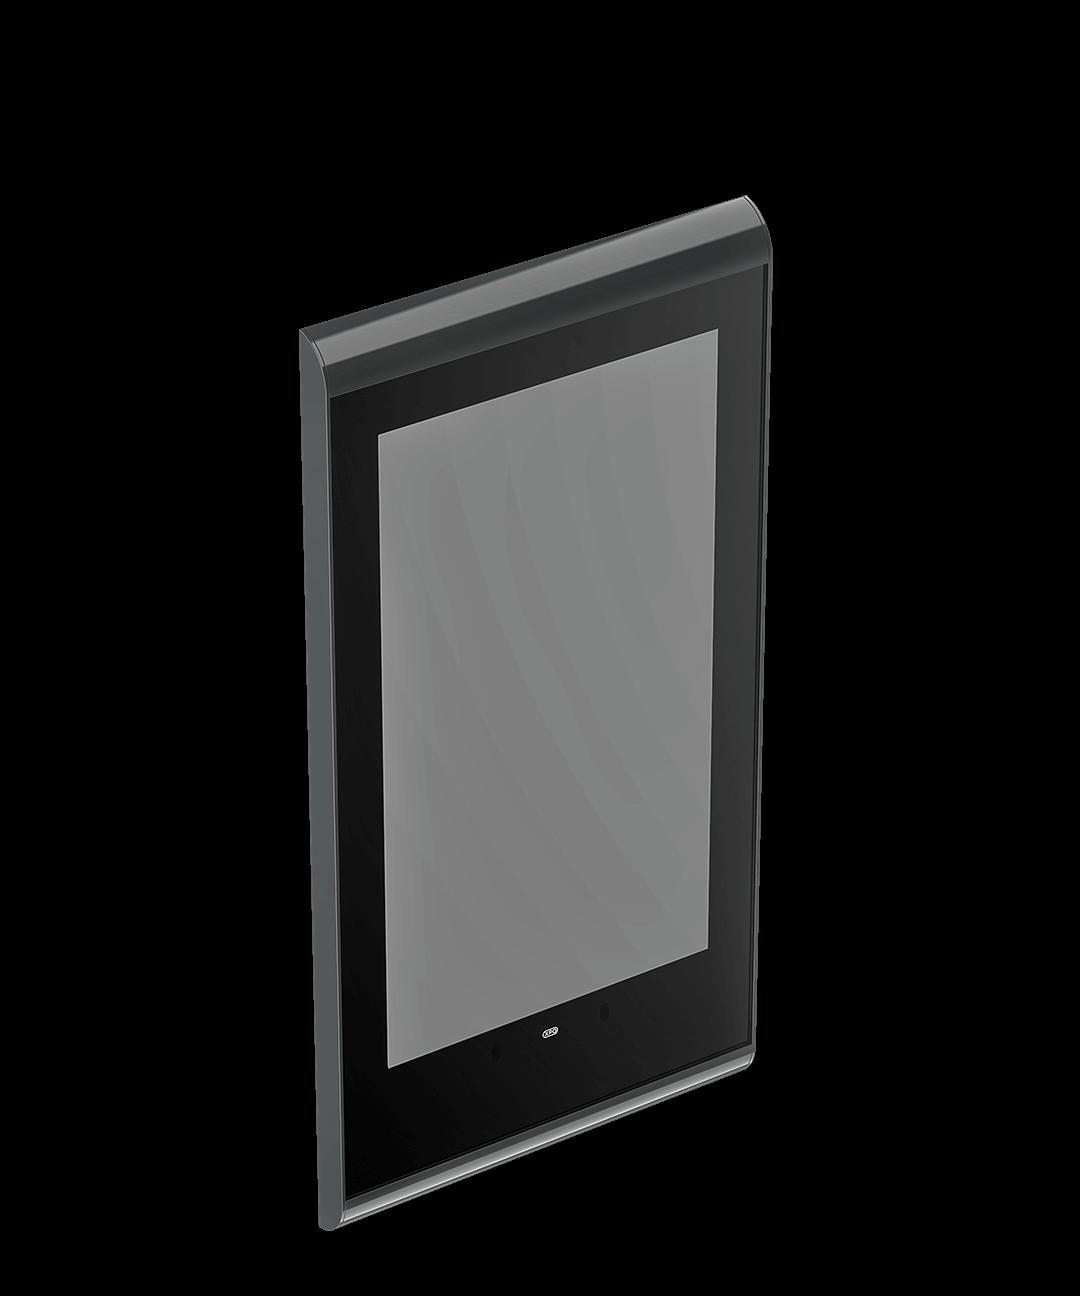 XPO Screens Invite 24PT Small - Daytona Gray Material